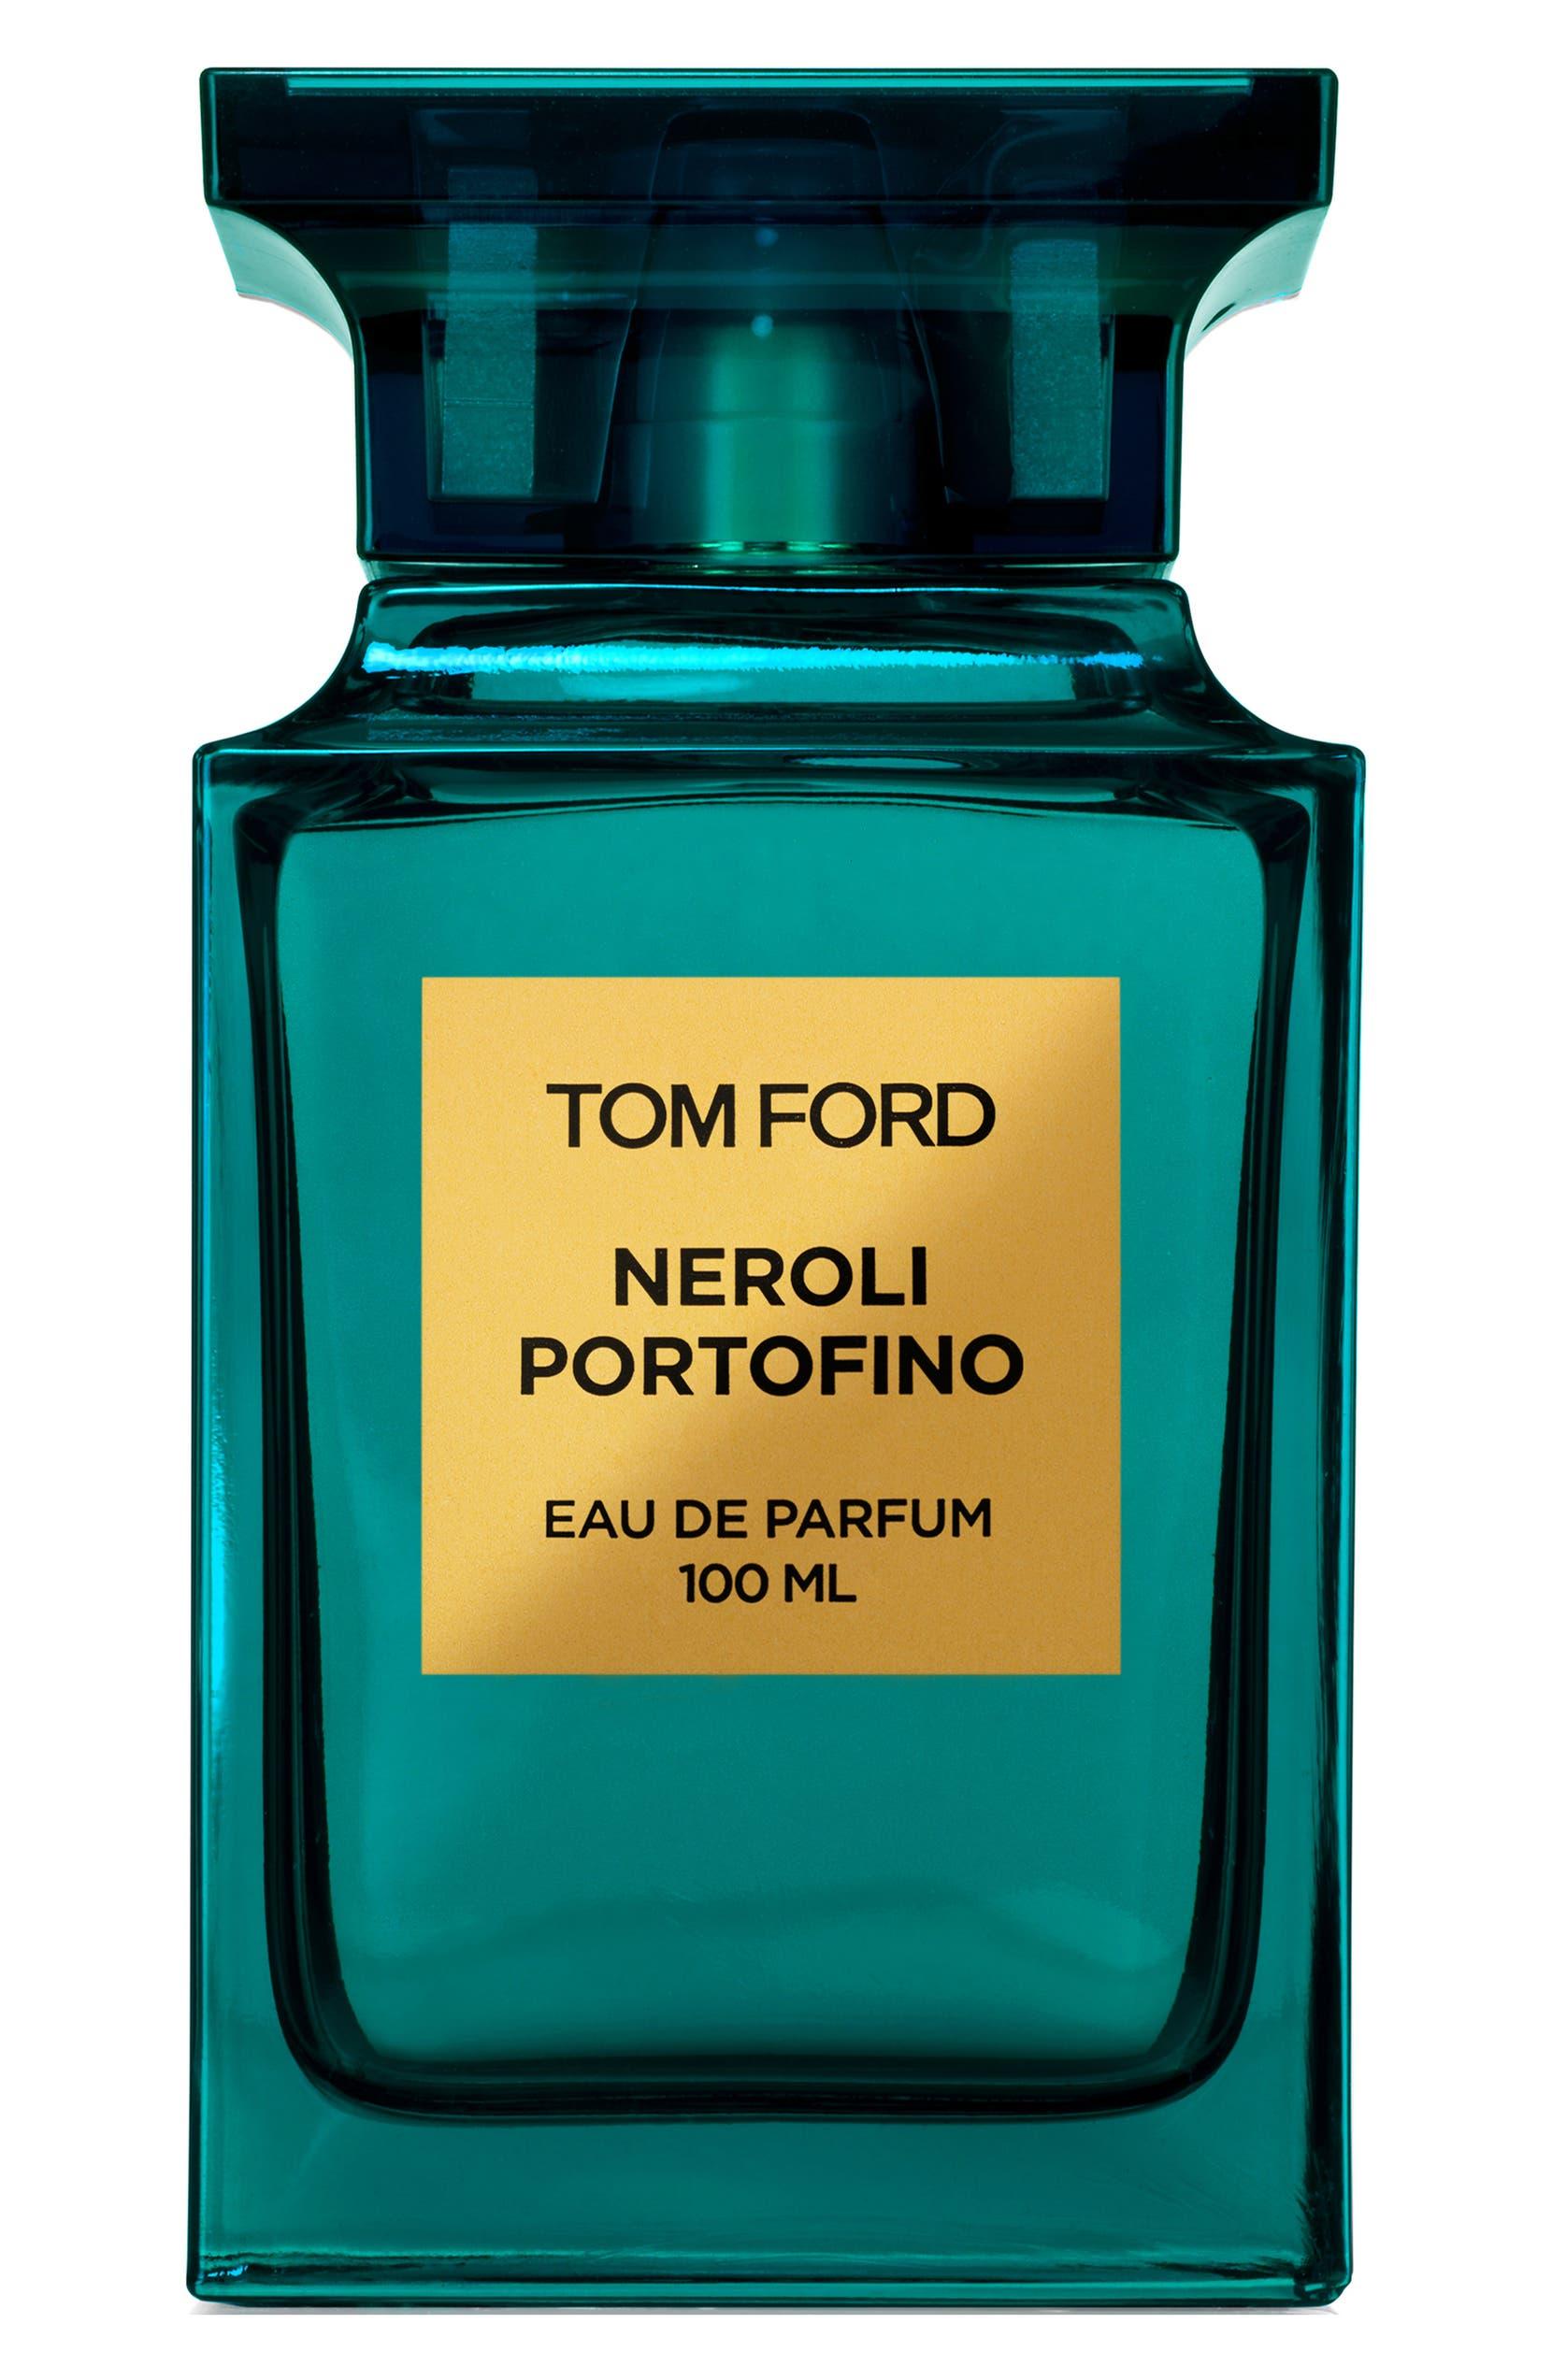 Neroli Private Parfum Blend De Eau Portofino 1lK5uFJ3Tc